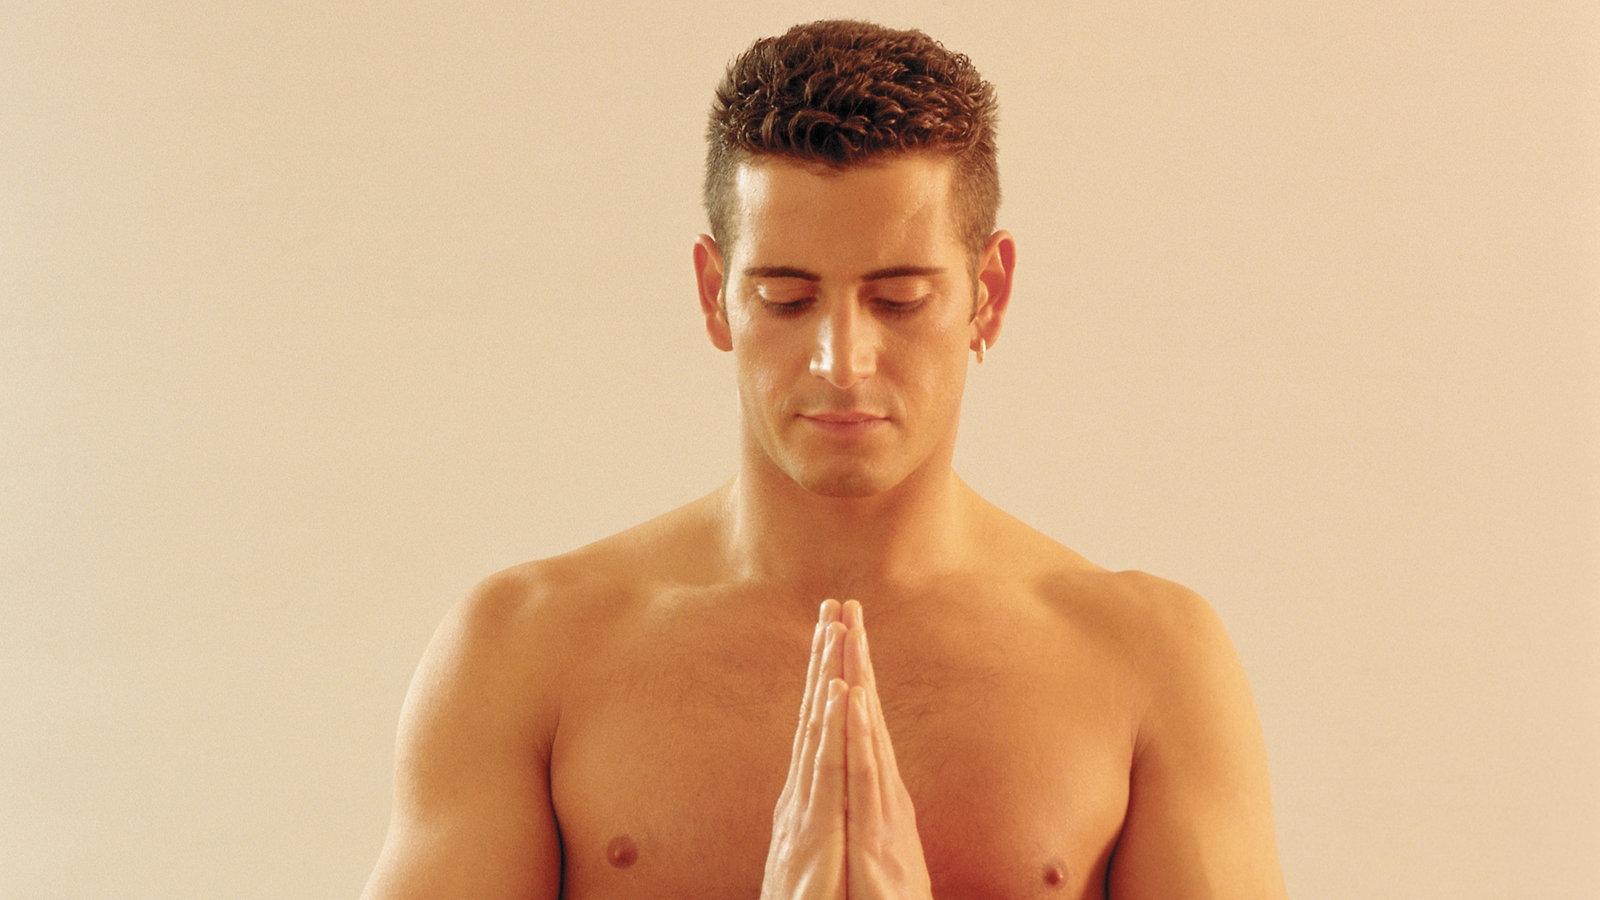 kultur leben nacktfotos schmerzen nicht